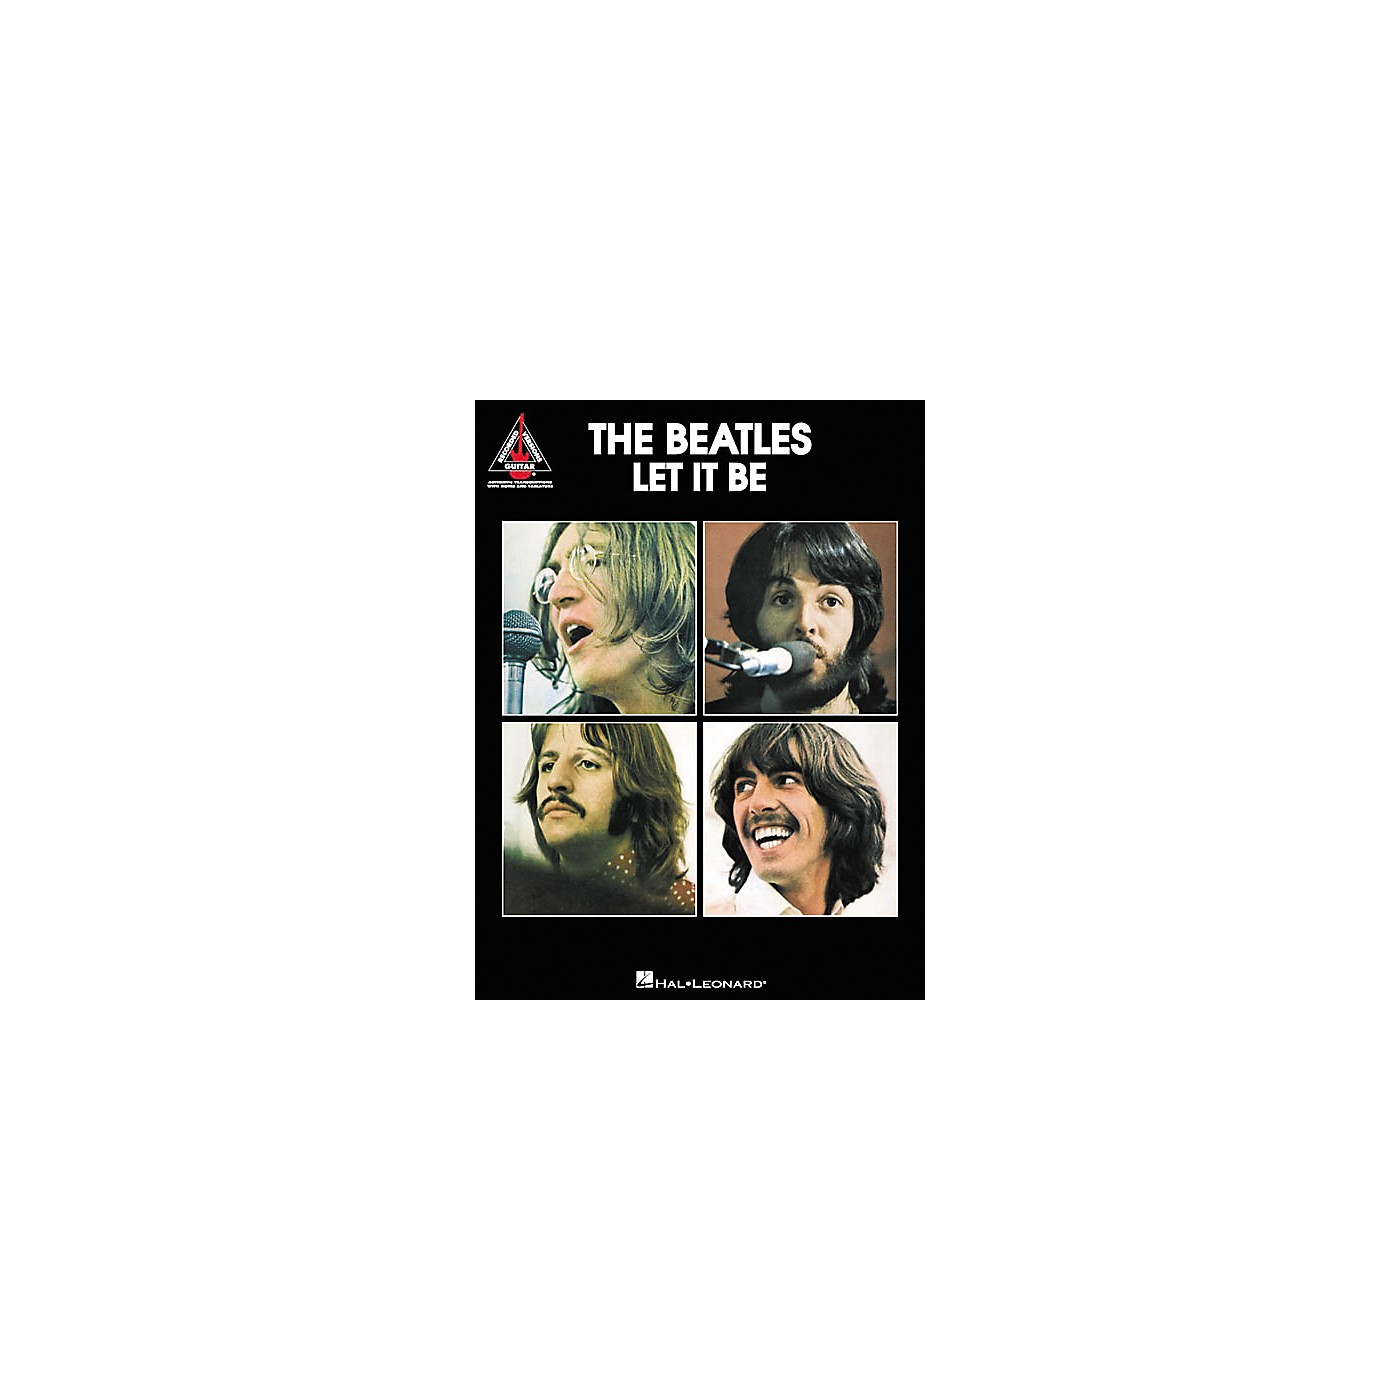 Hal Leonard The Beatles Let It Be Guitar Tab Songbook thumbnail